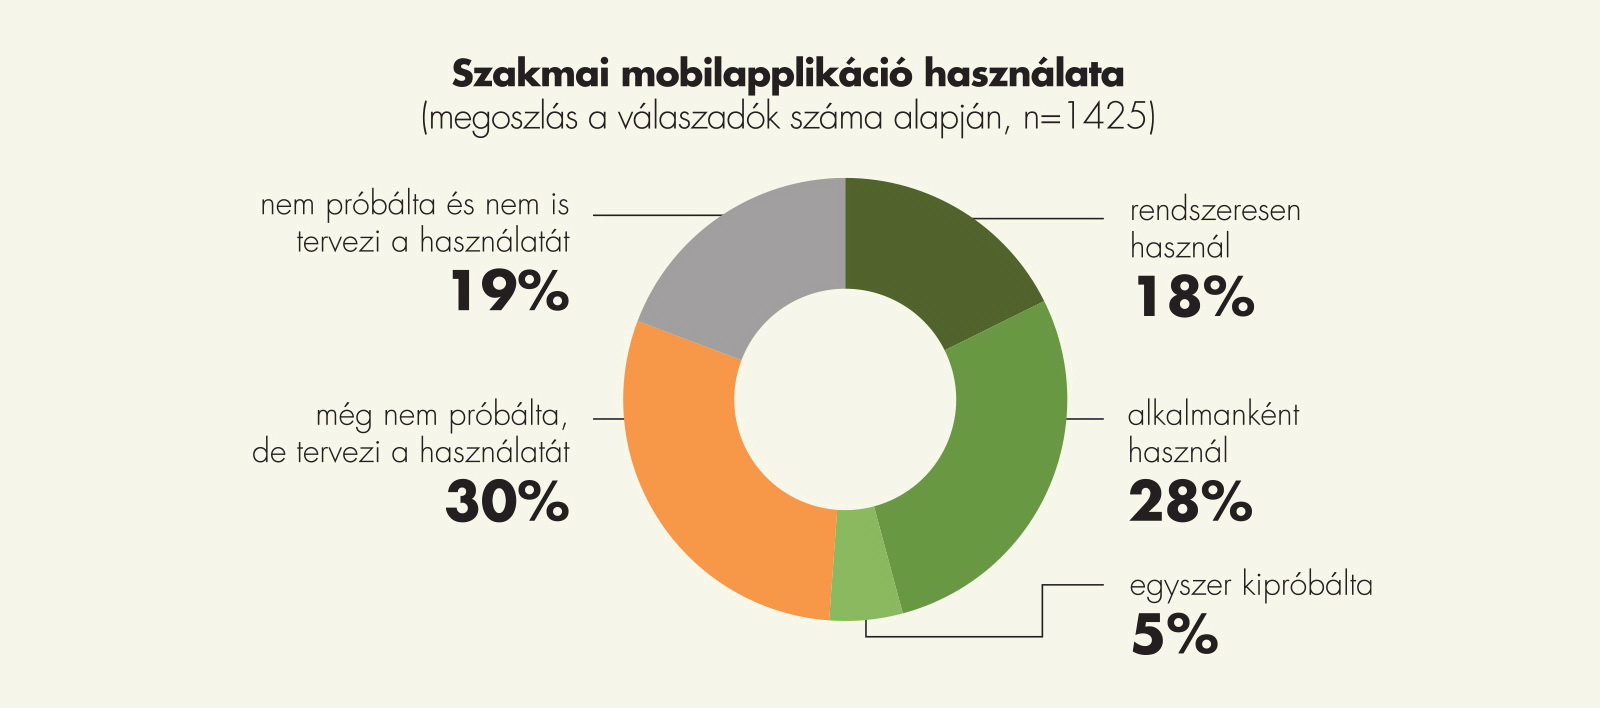 ascikk3_digitalis_agrargazdasag_abra2_2021feb.jpg